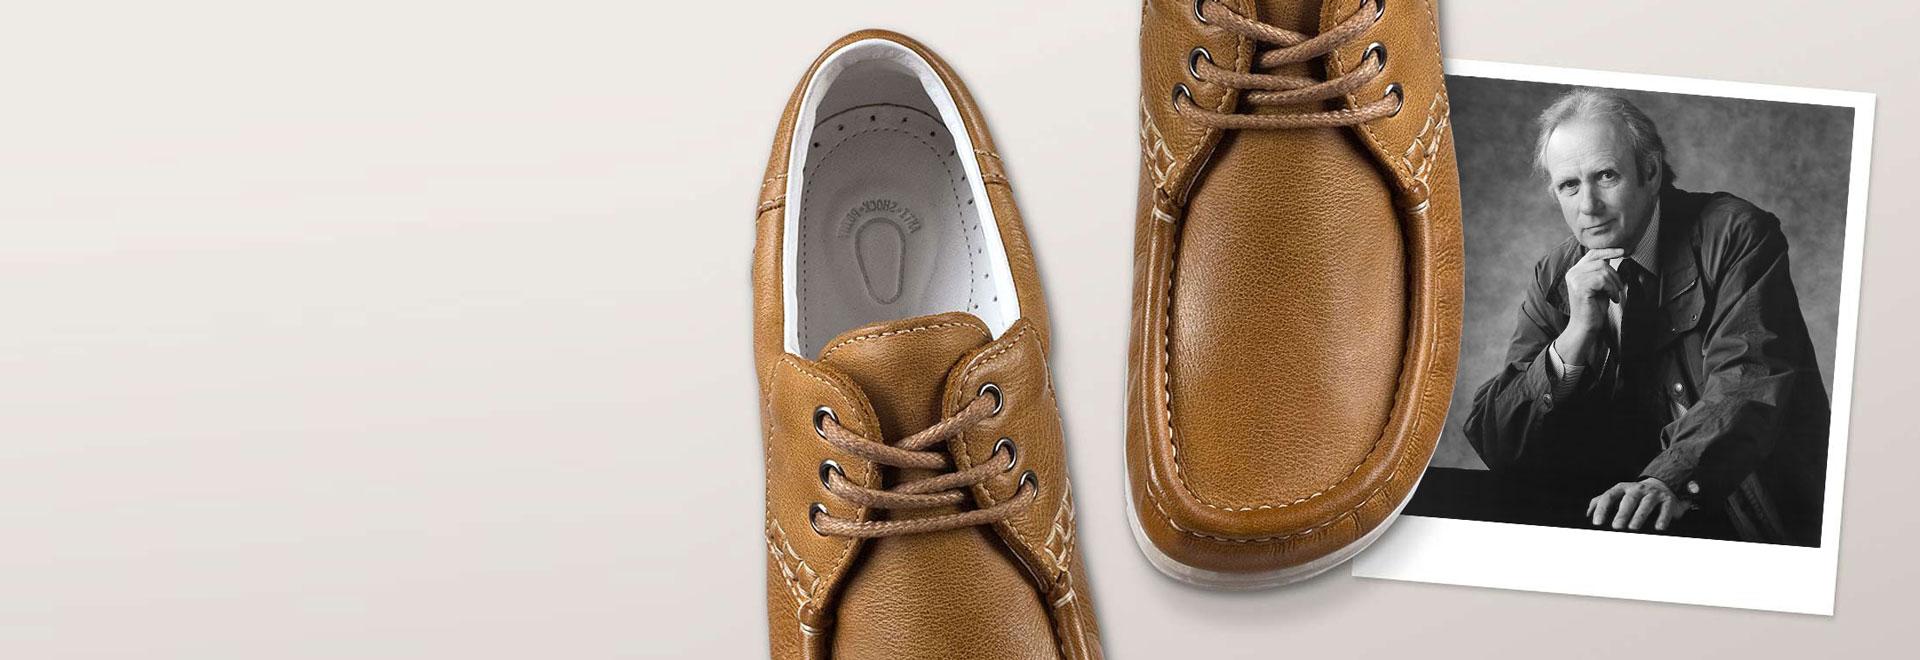 ecco shoes michigan